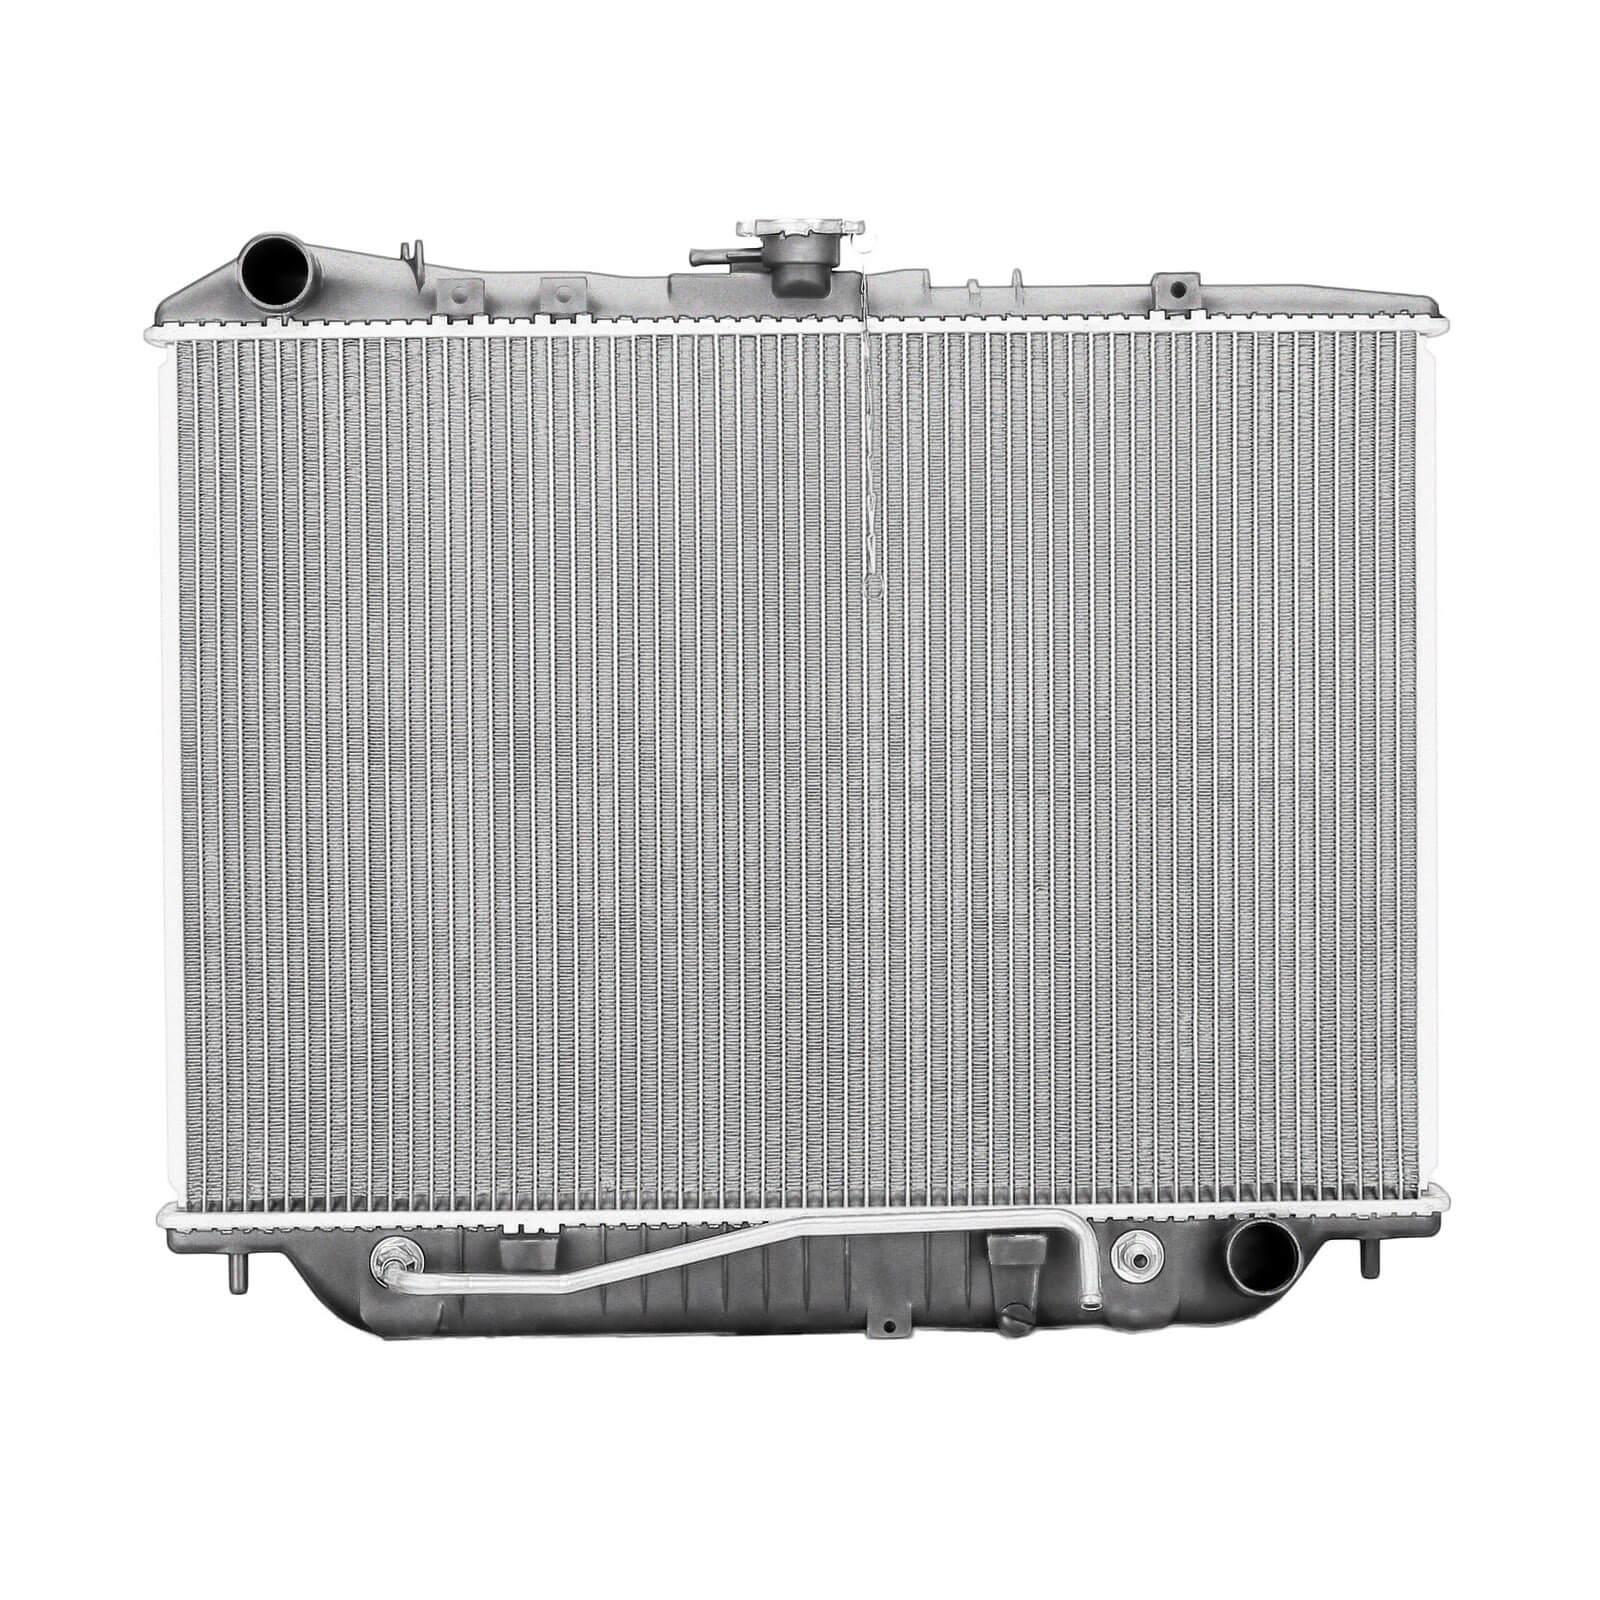 Dromedary Brand dpi 181 isuzu custom 1996 honda accord radiator